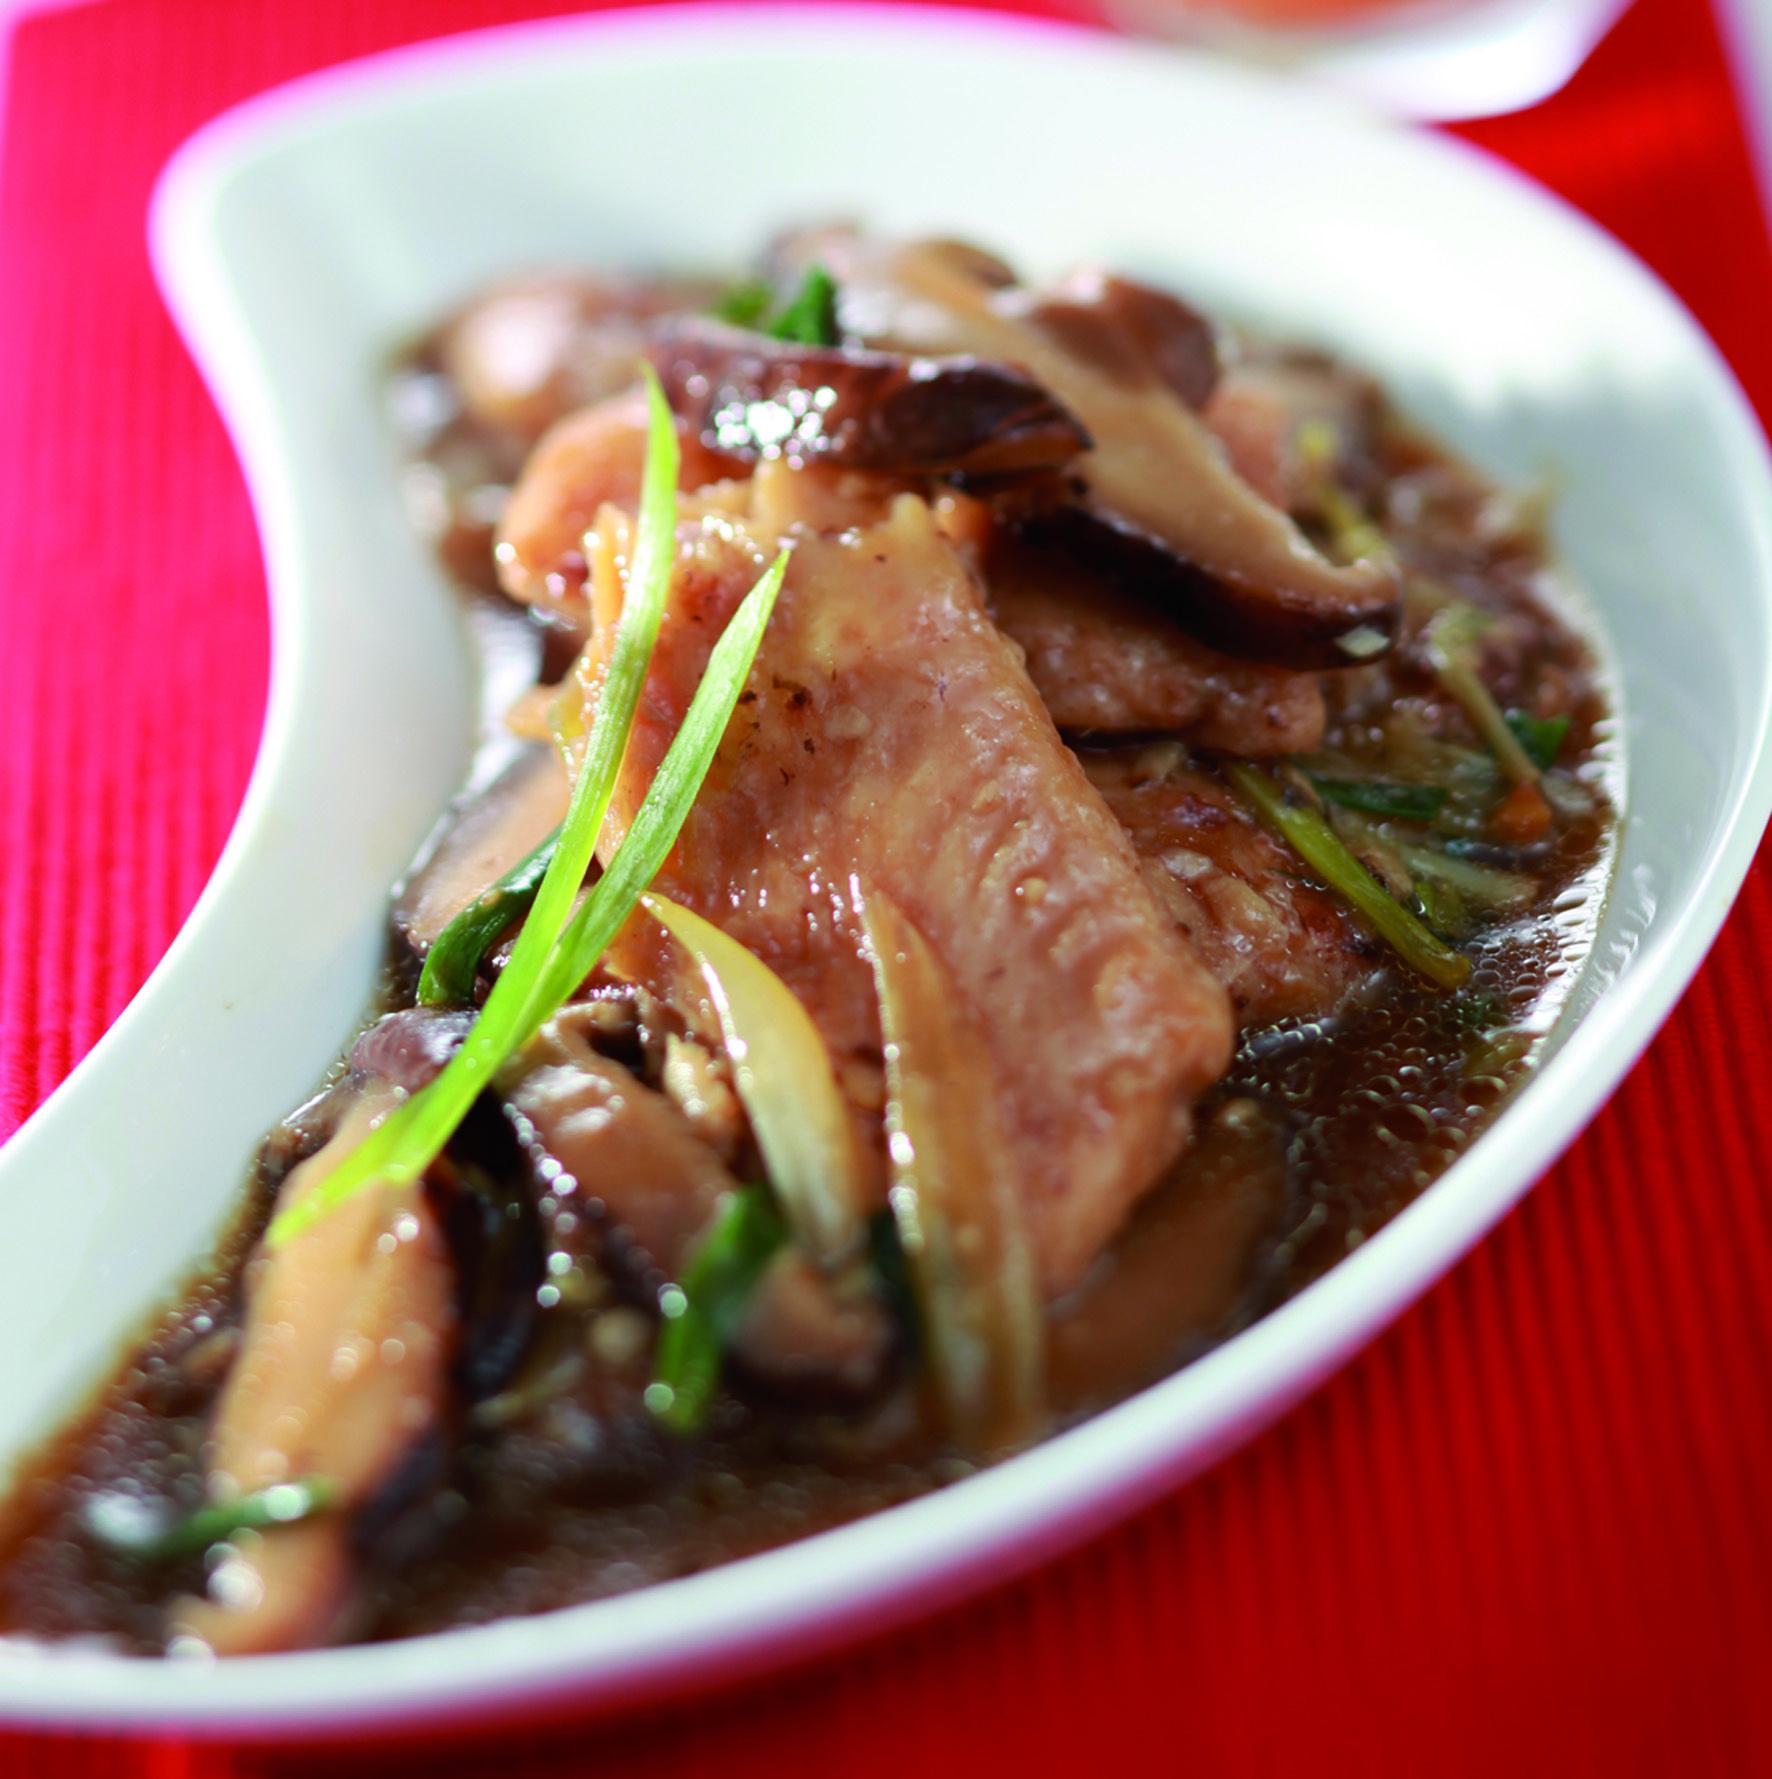 Resep Sehat Tim Ikan Dori Ala Hongkong Intisari Online Resep Resep Sehat Kesehatan